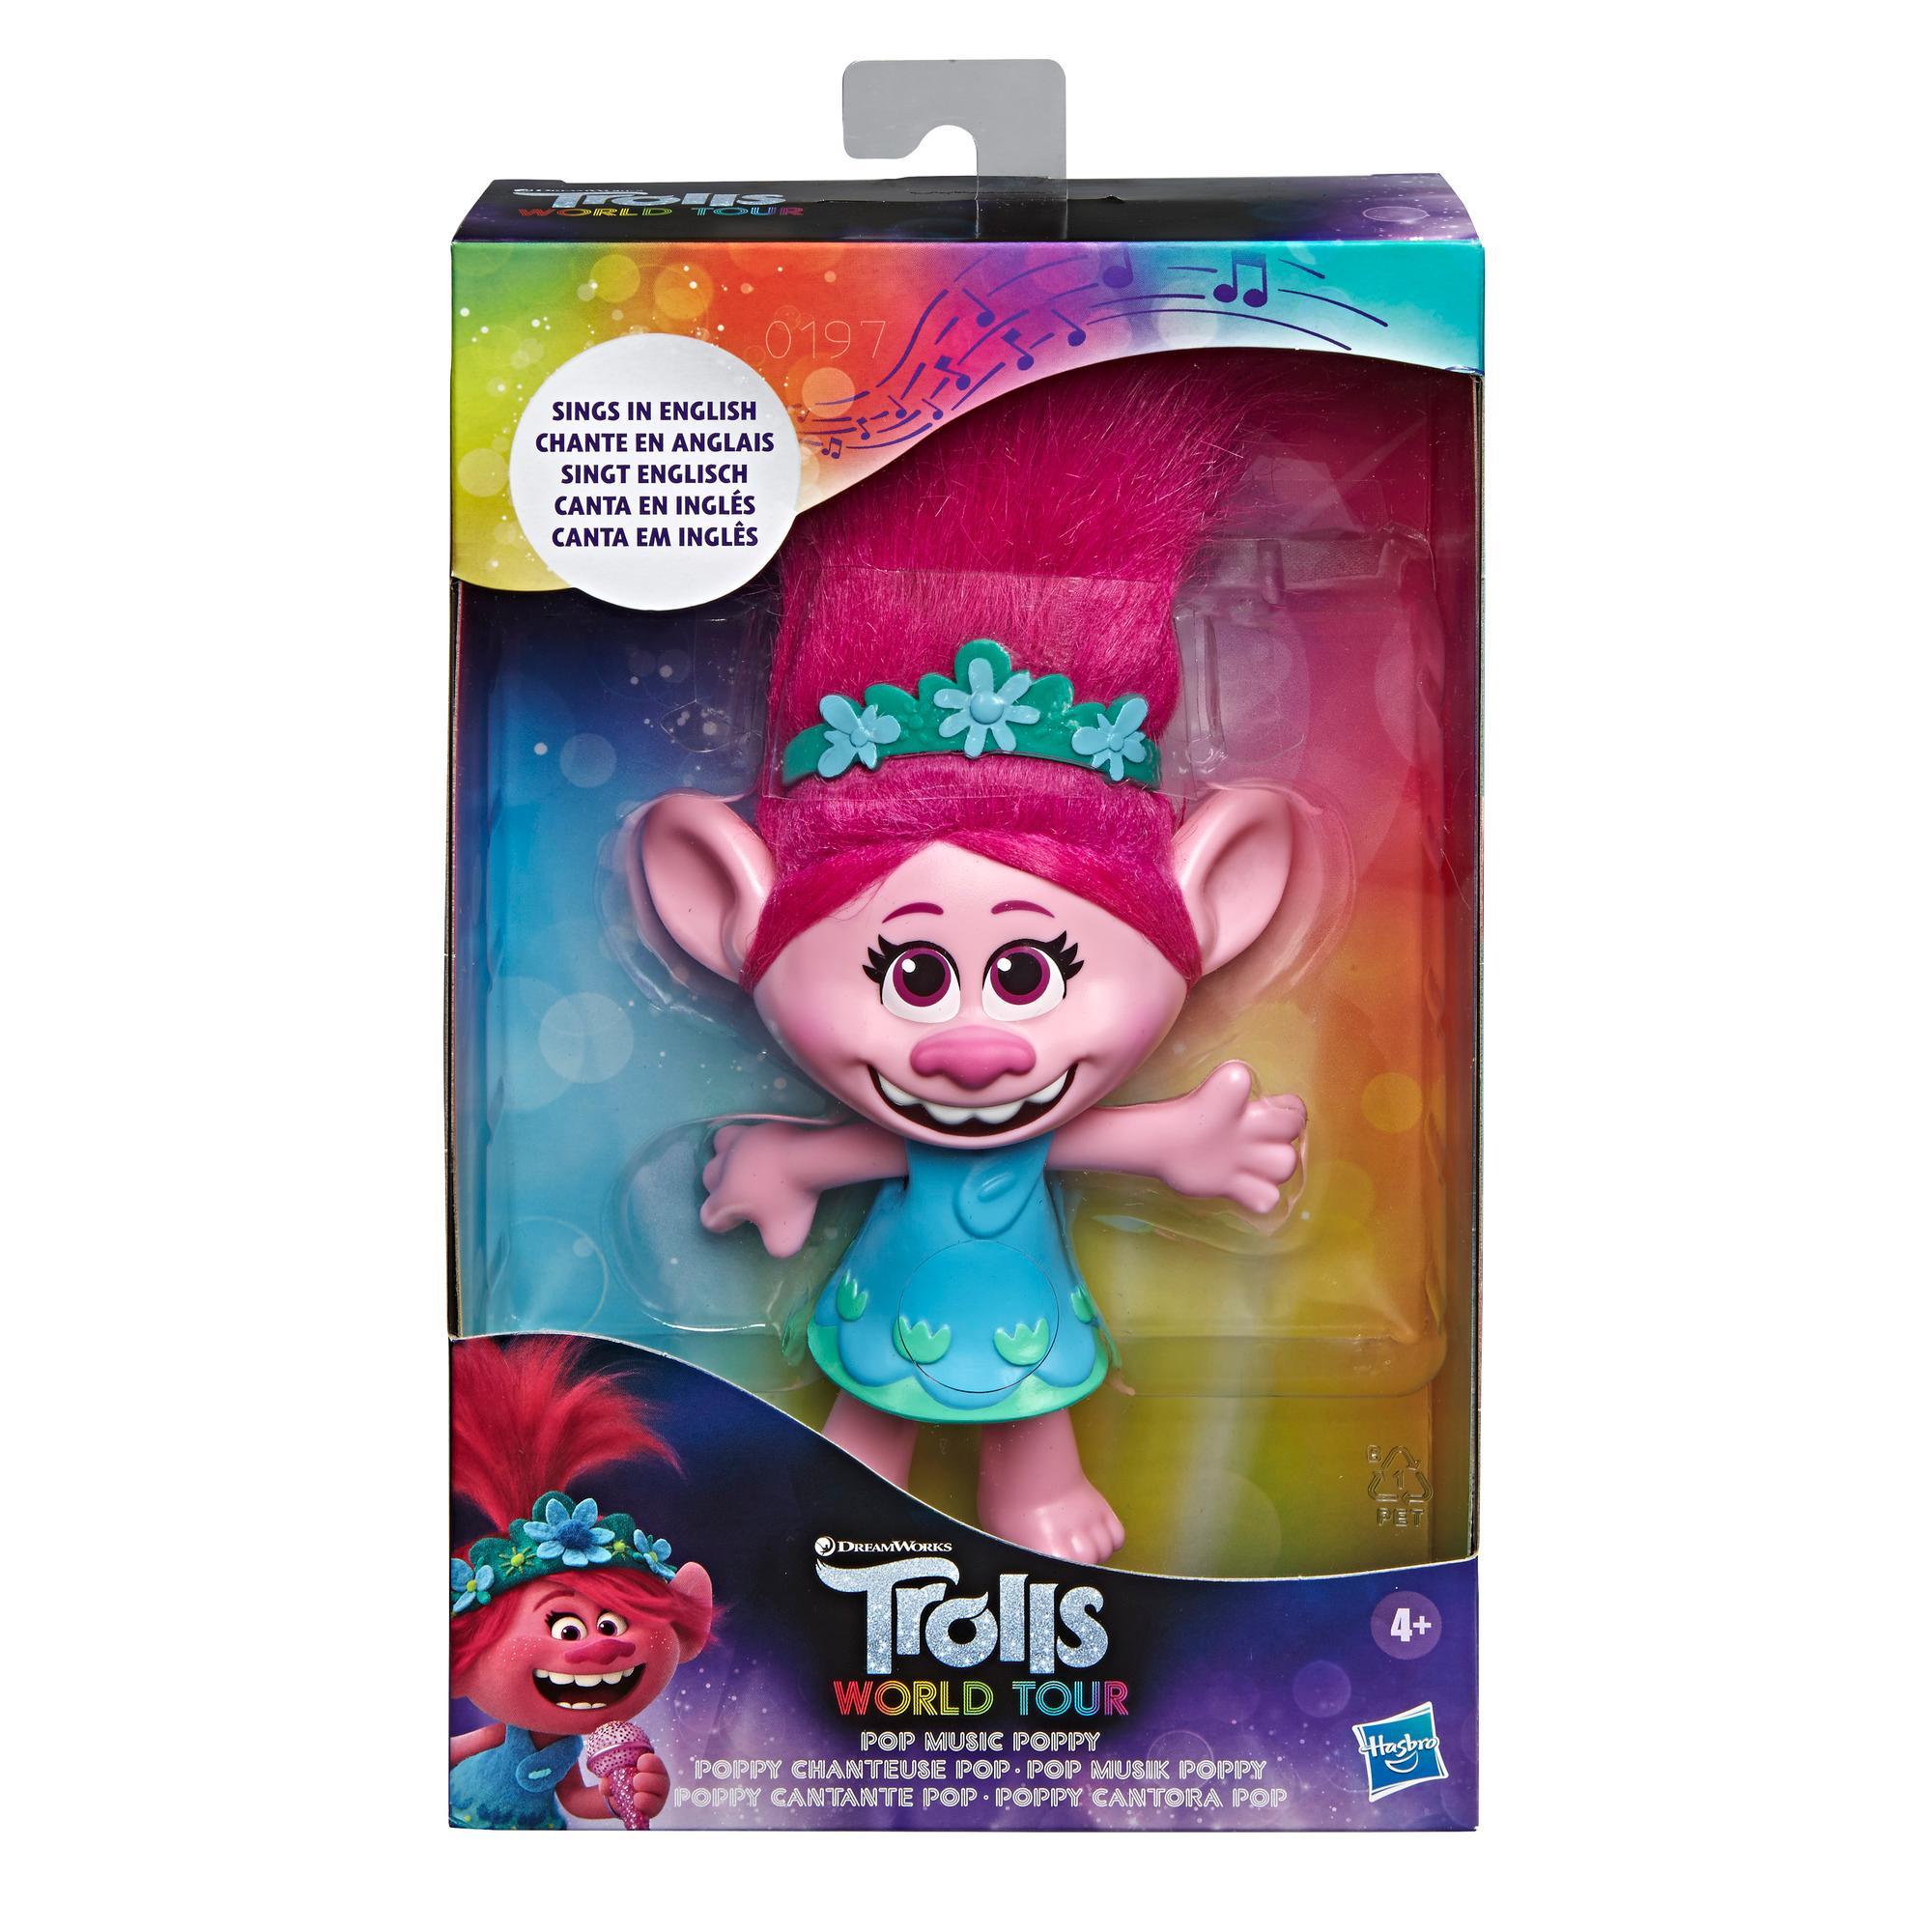 DreamWorks Trolls Popmuziek Poppy zingende speelgoedpop, zingt Trolls Just Want to Have Fun uit de DreamWorks-film Trolls World Tour